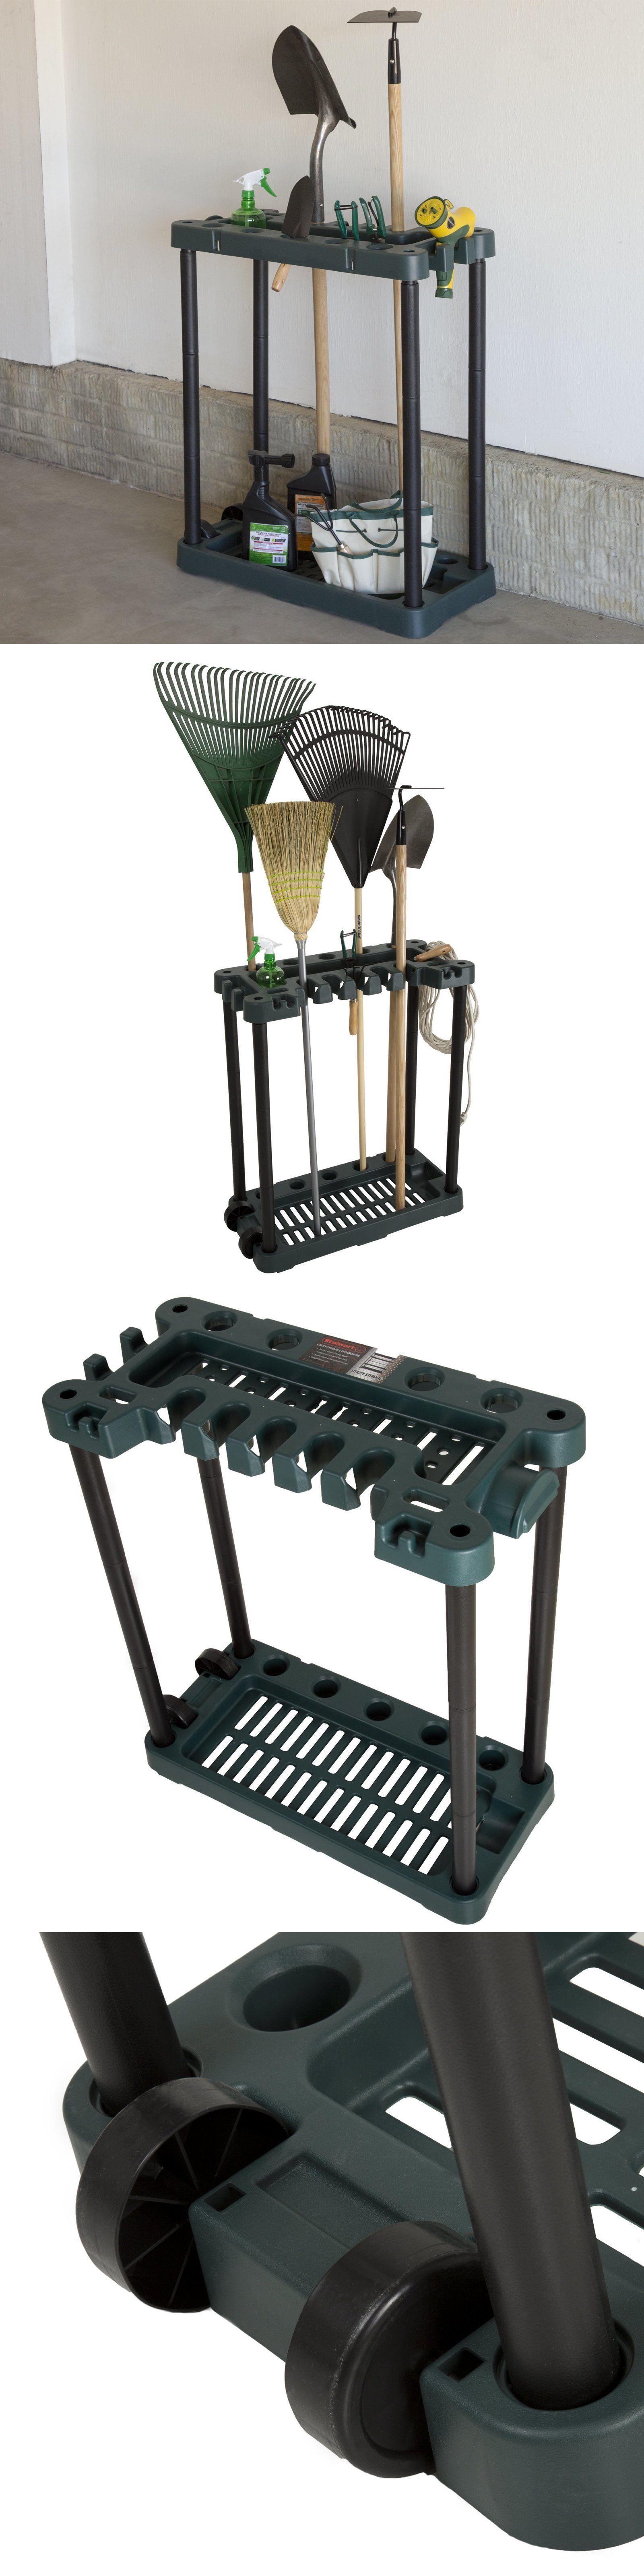 garden tool racks 181011: rack organizer storage broom rake